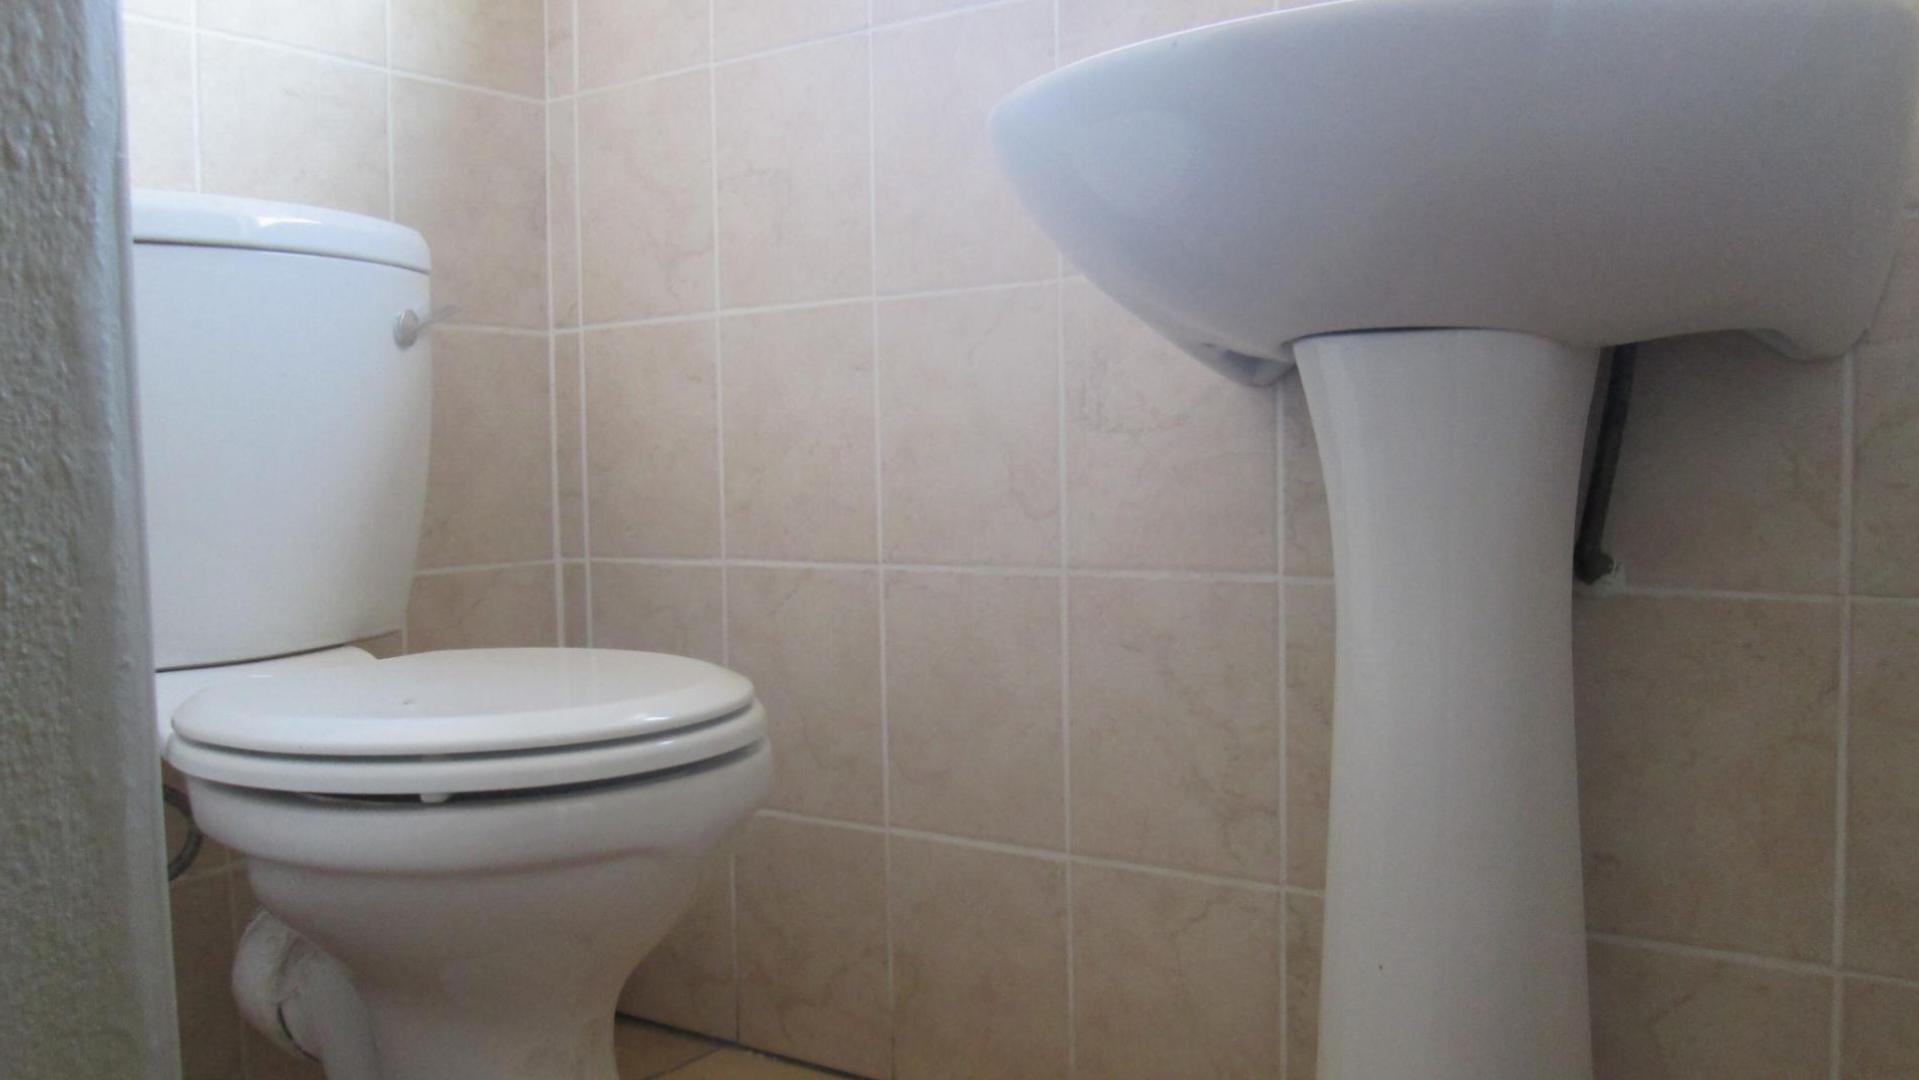 2 Bedroom Sectional Title for Sale For Sale in Vanderbijlpark - Home ...